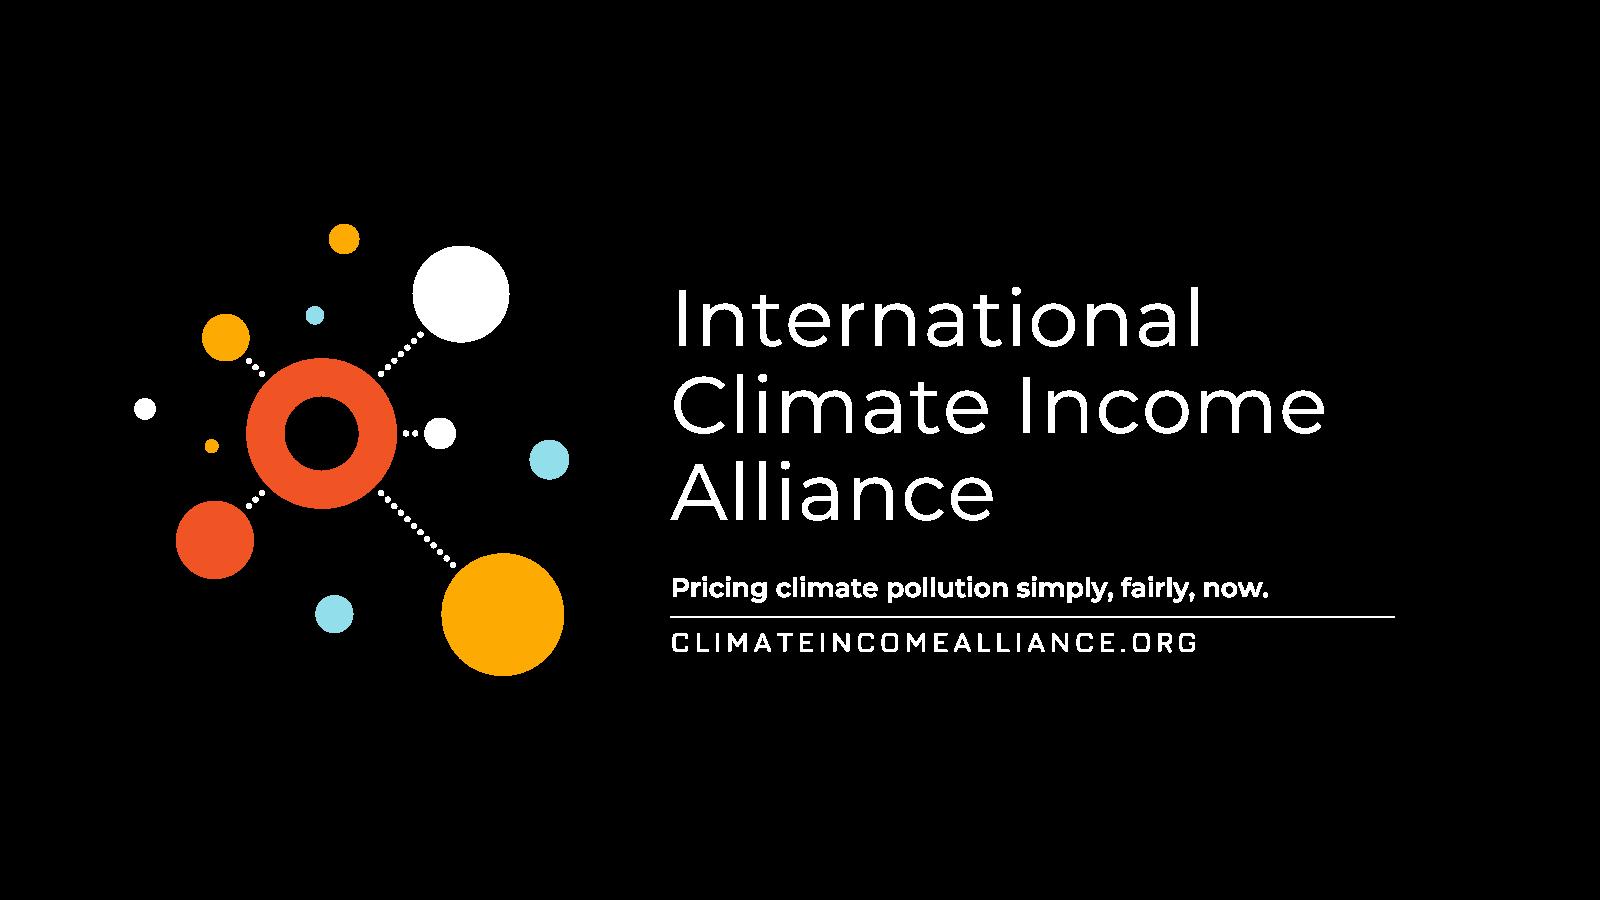 International Climate Income Alliance